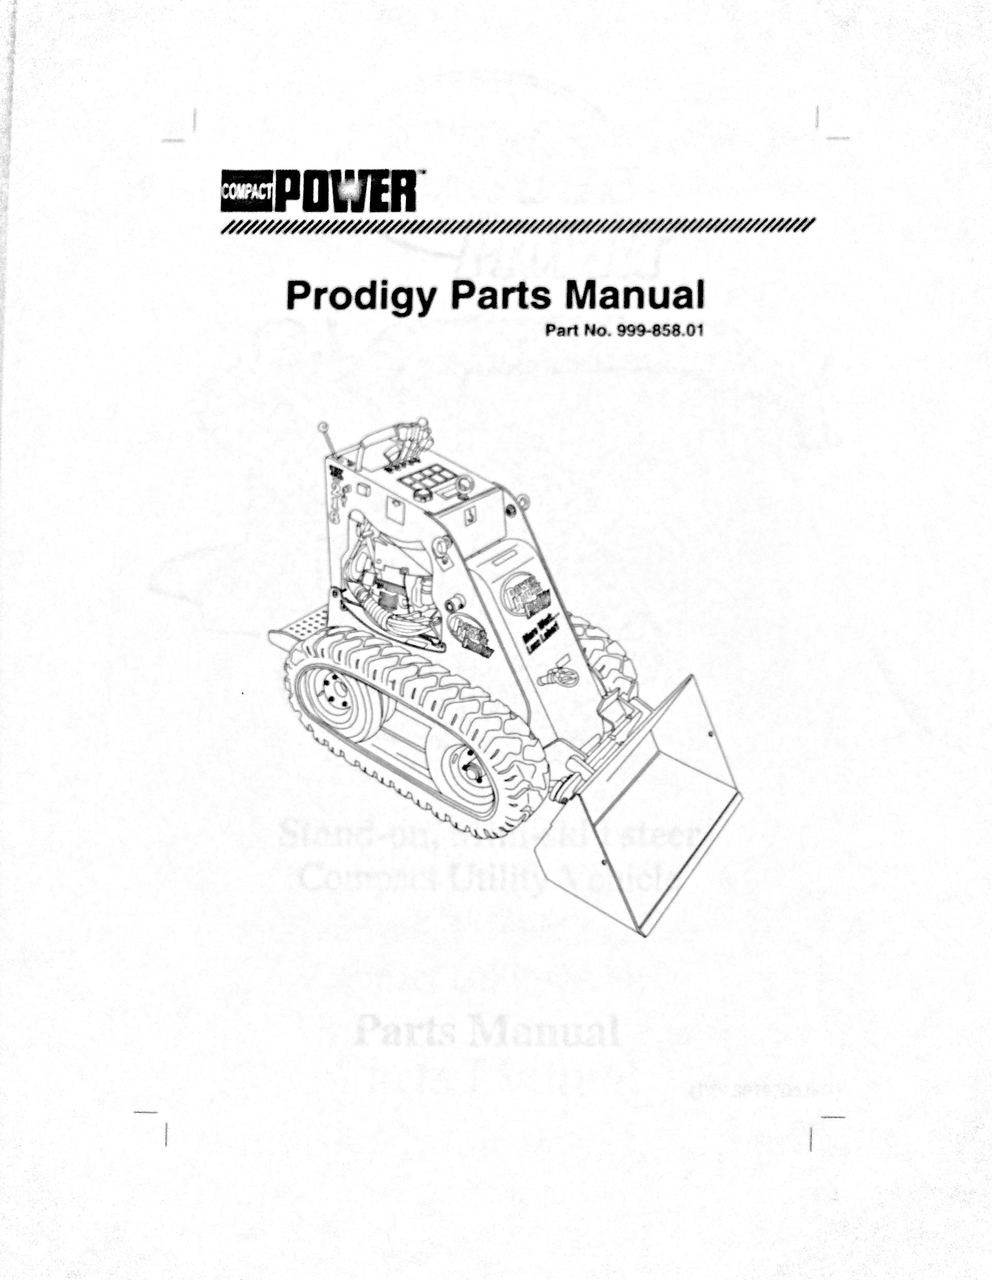 Compact Power Prodigy Parts Manual TK216